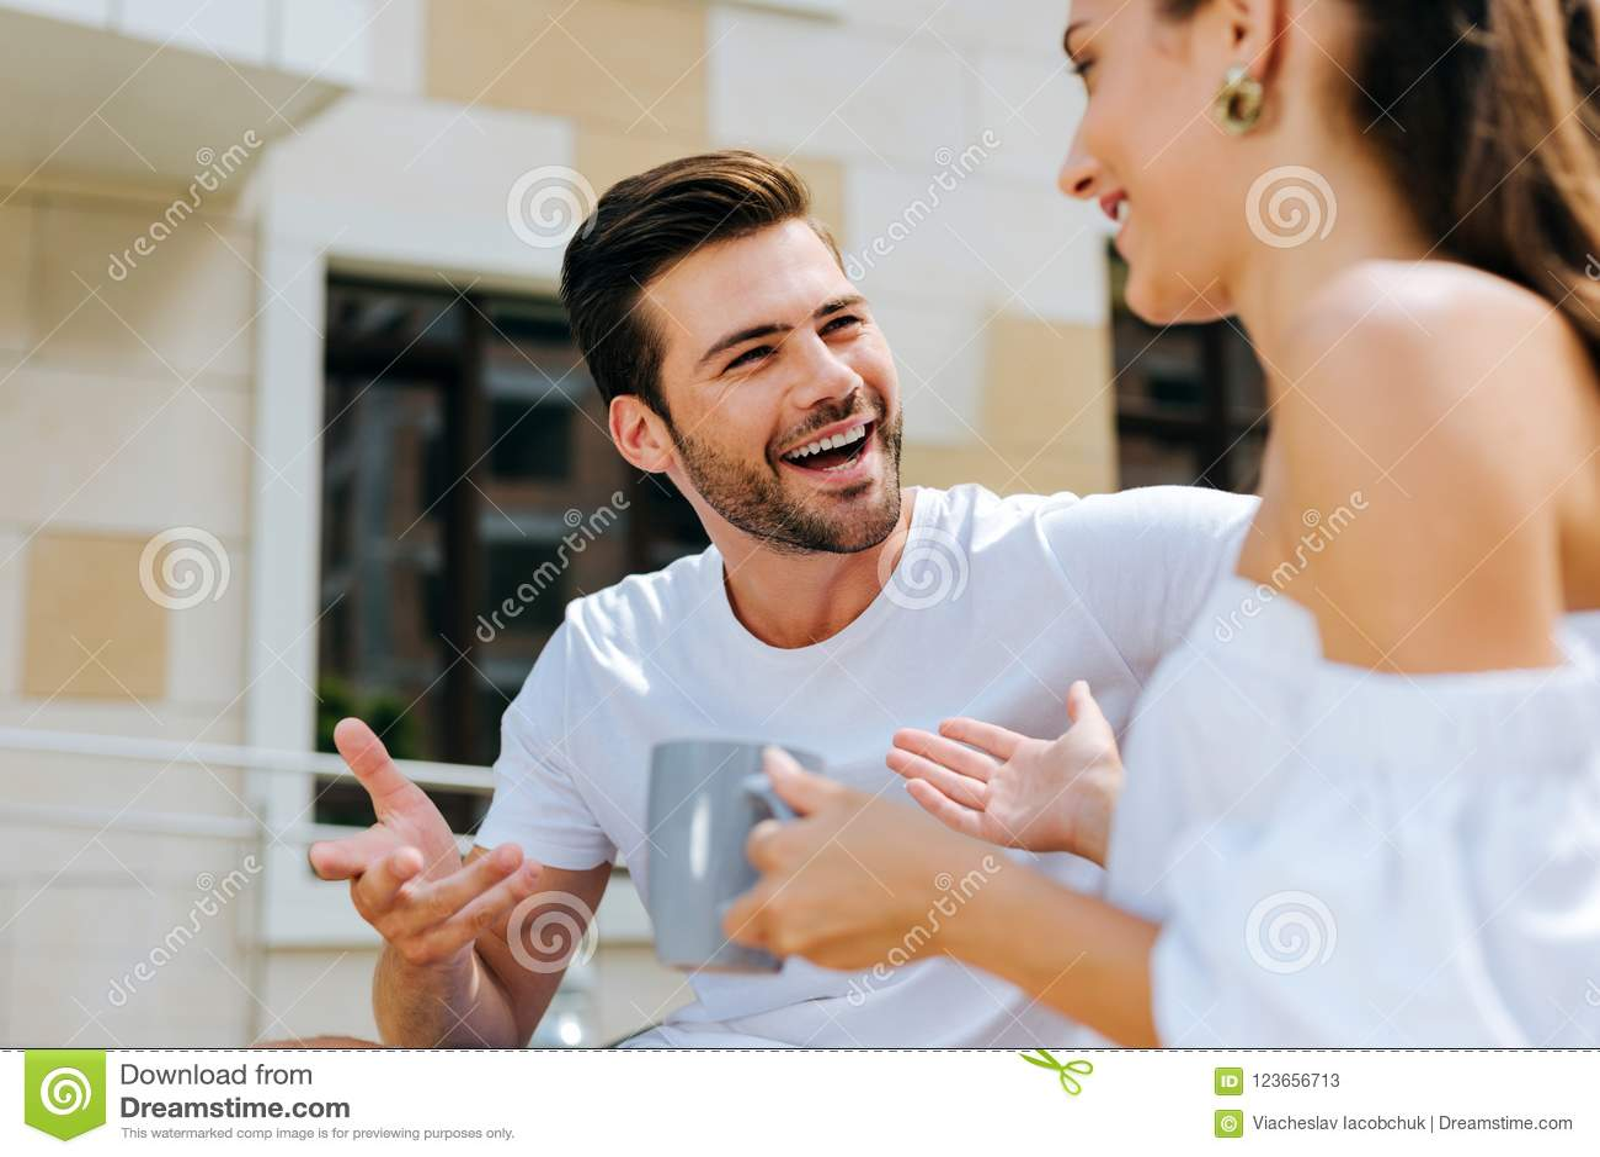 man to man conversation